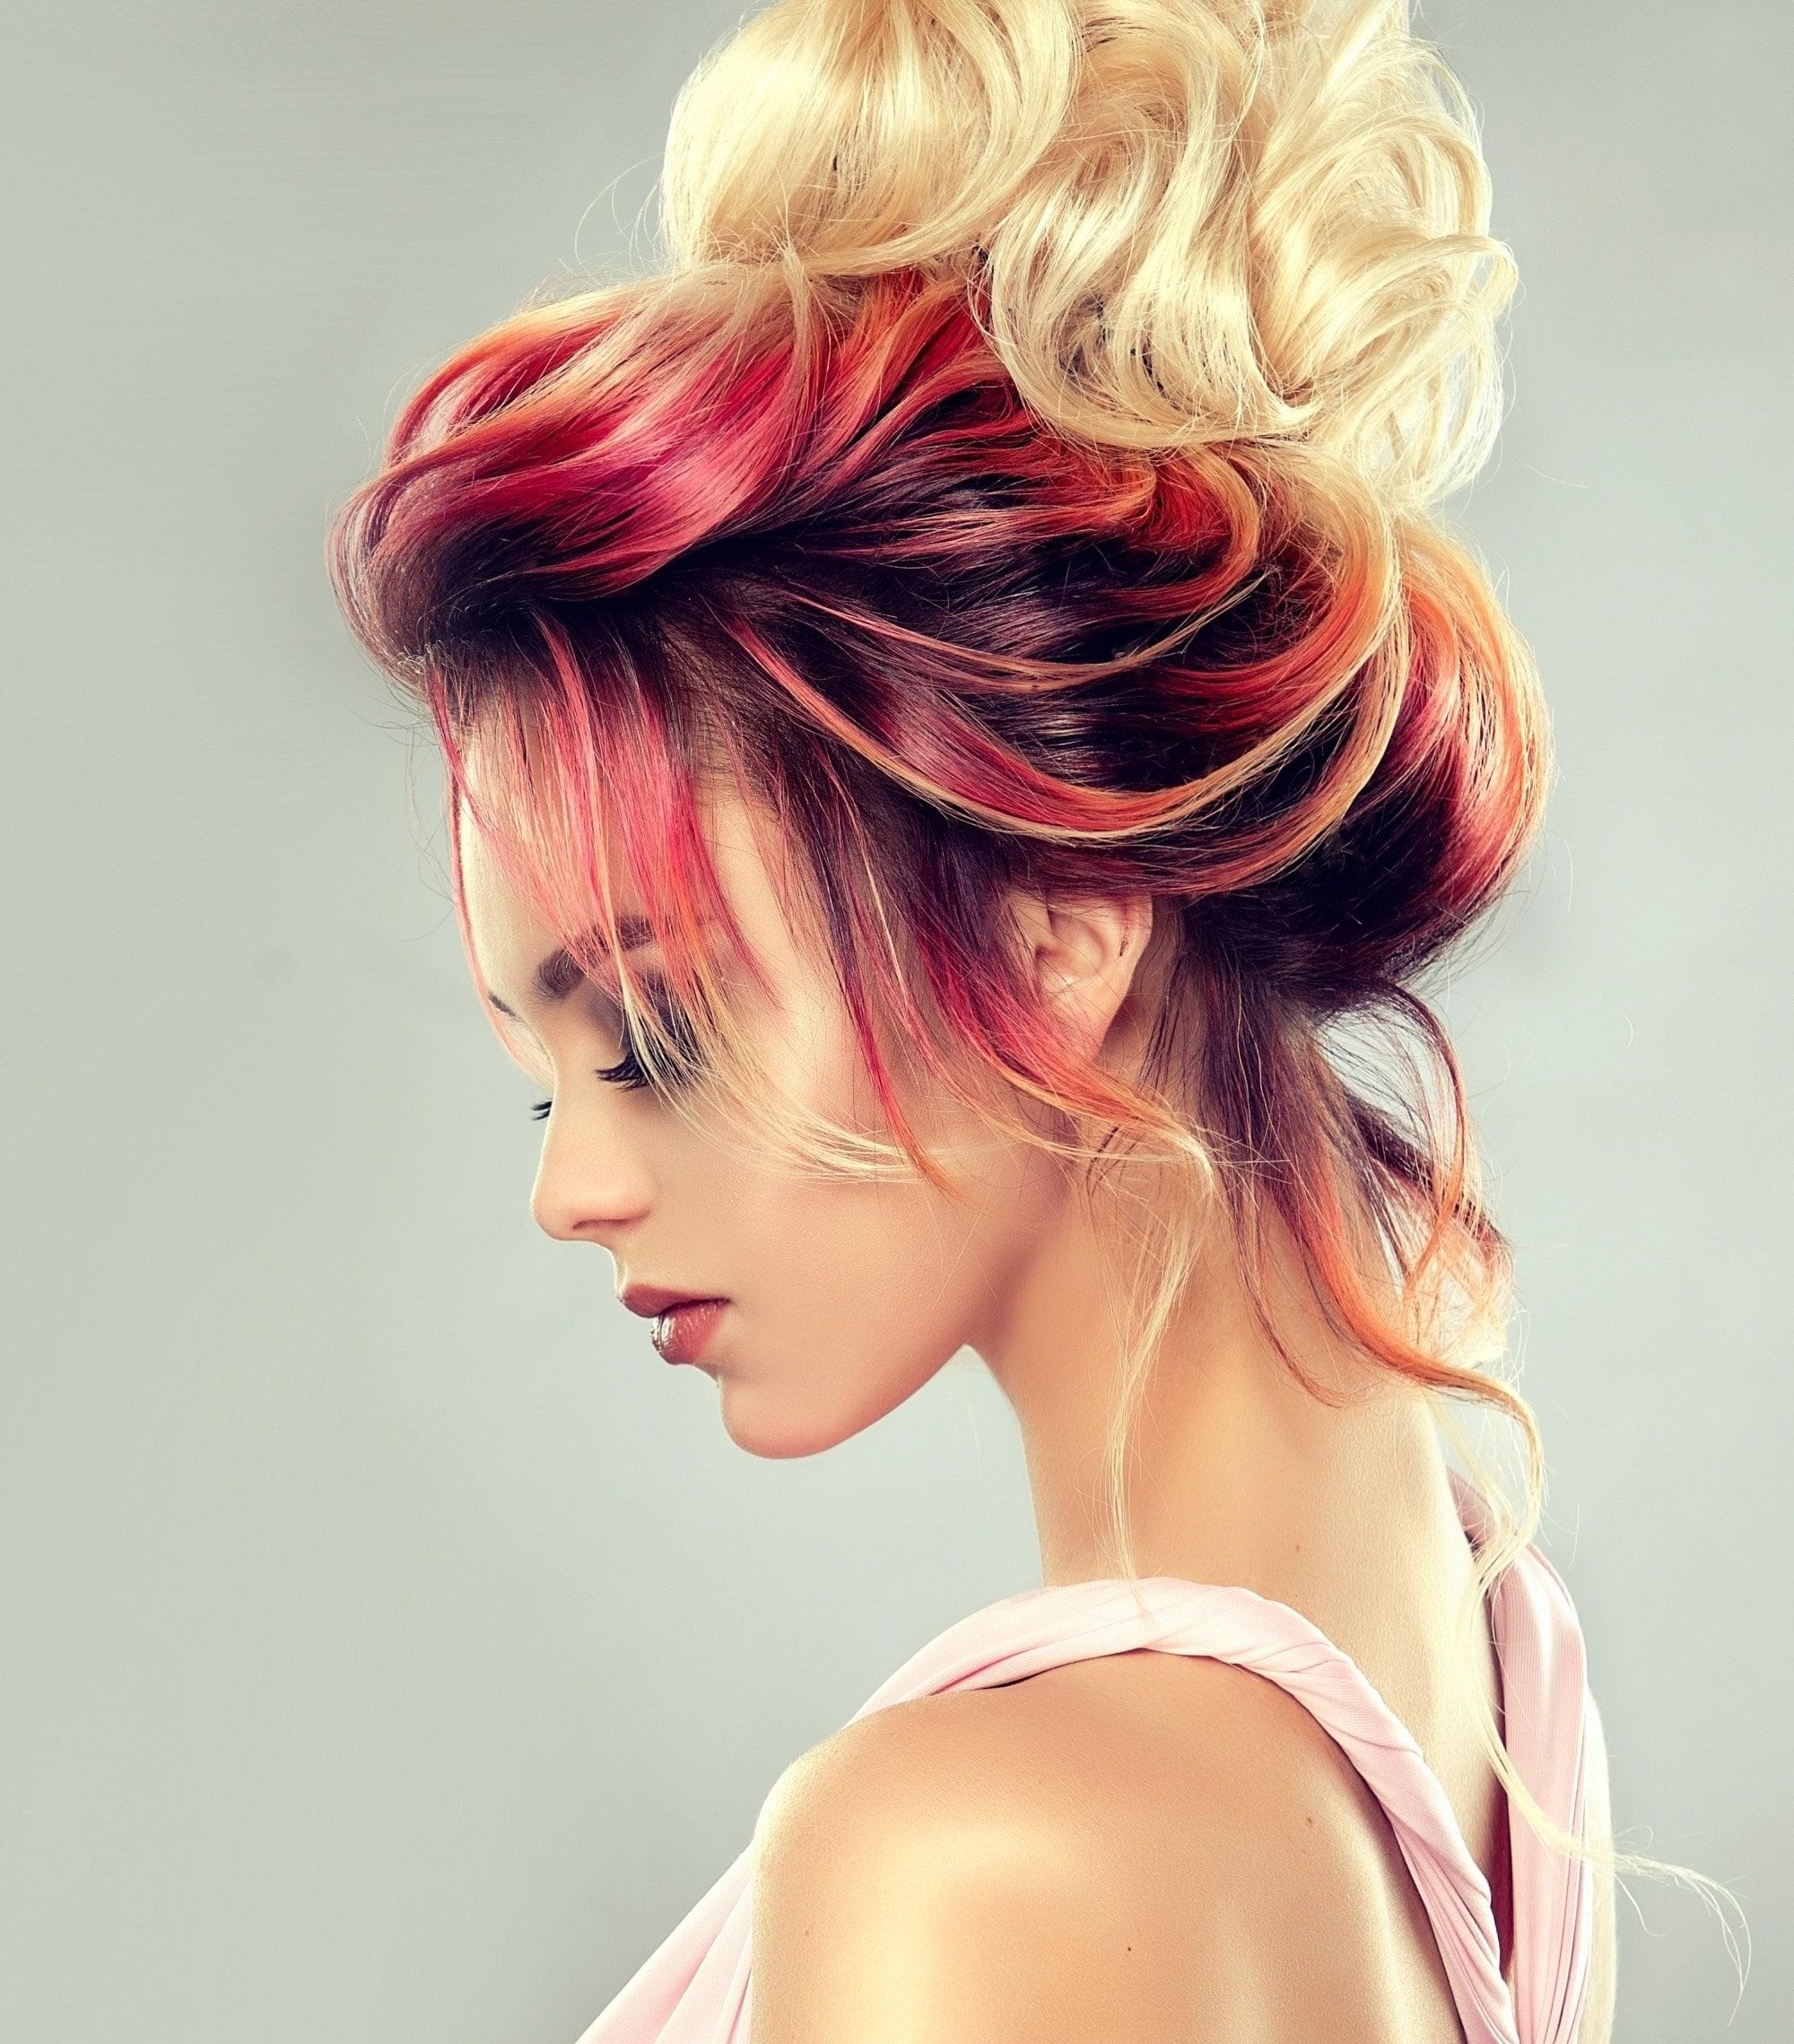 Mahogany Hair Color: Profile shot of woman with mahogany blonde ombre hair